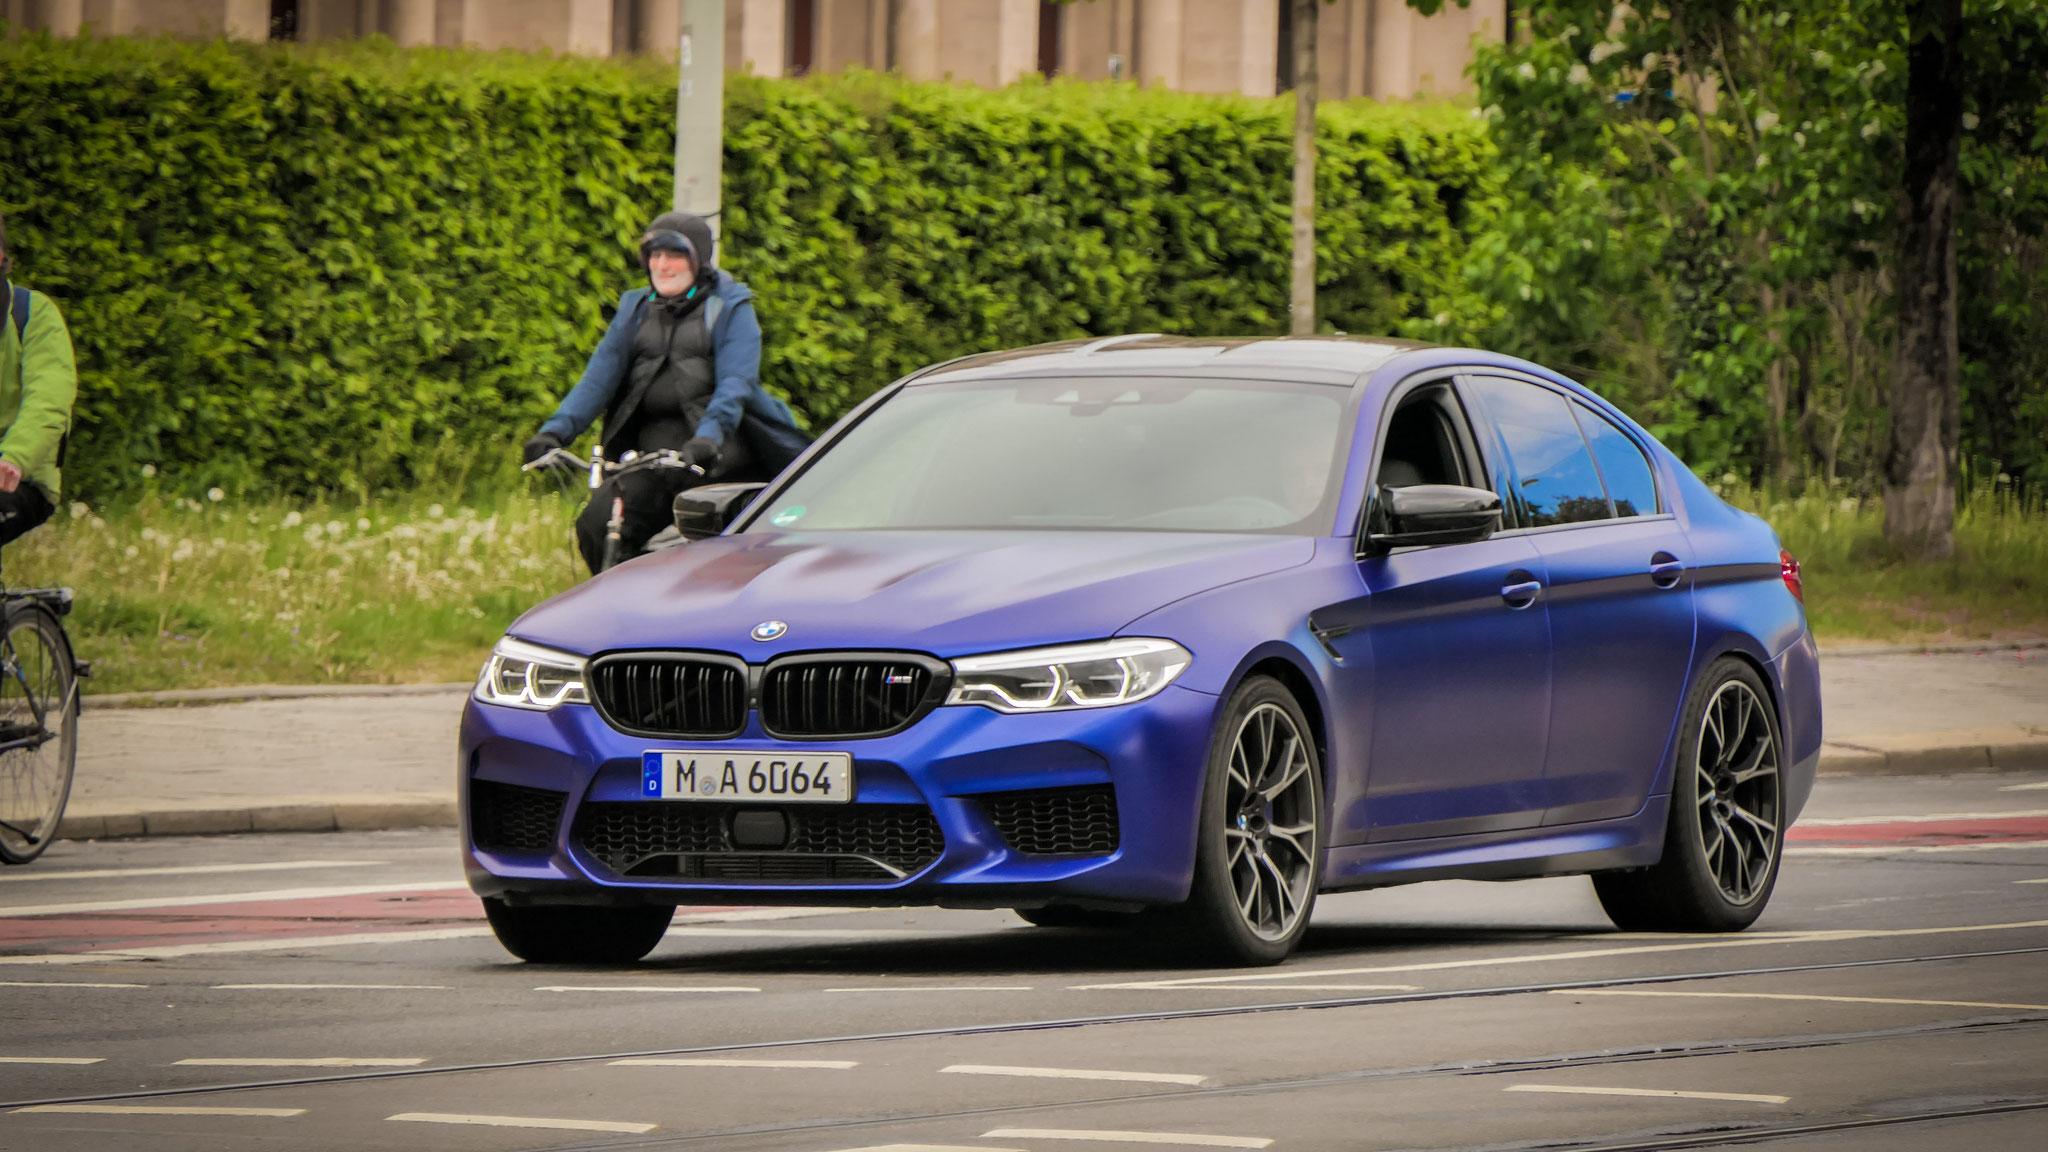 BMW M5 - M-A-6064